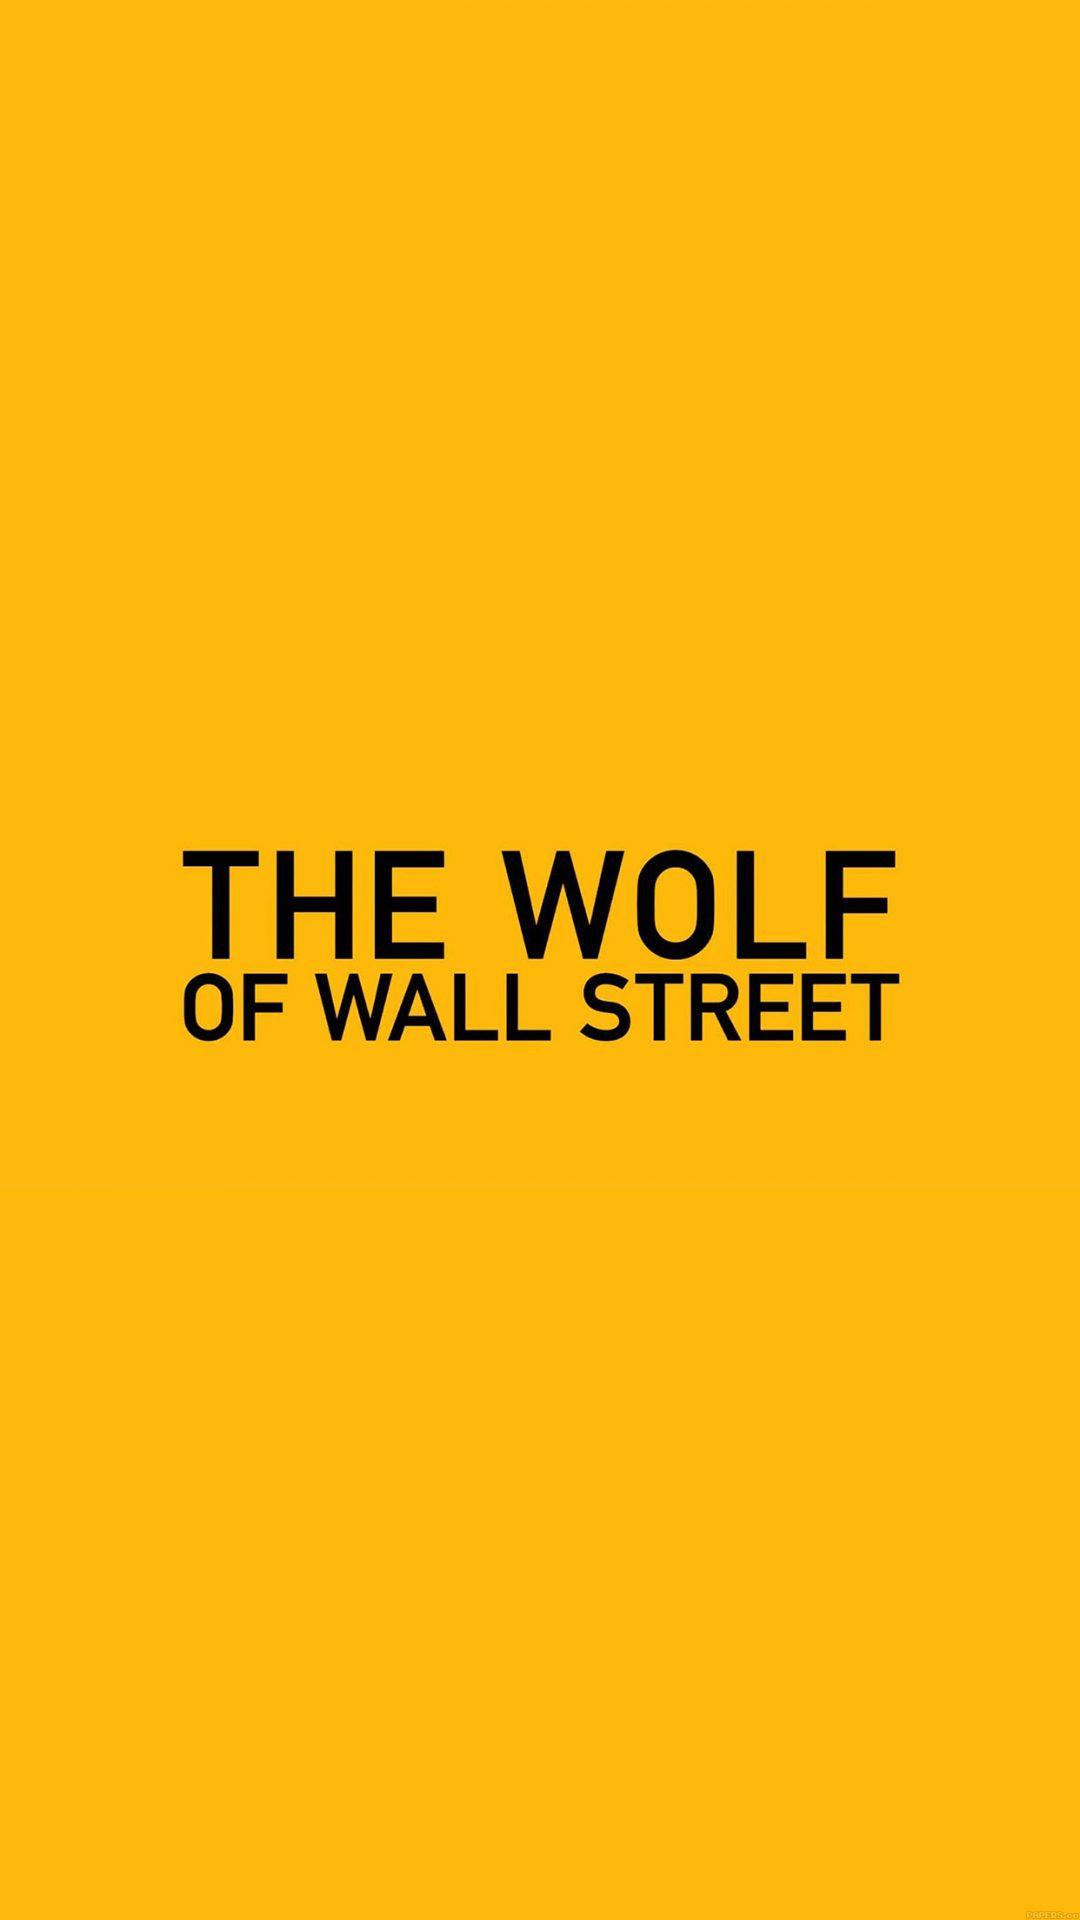 Wallpaper The Wolf Of Wallstreet Yellow Film Logo